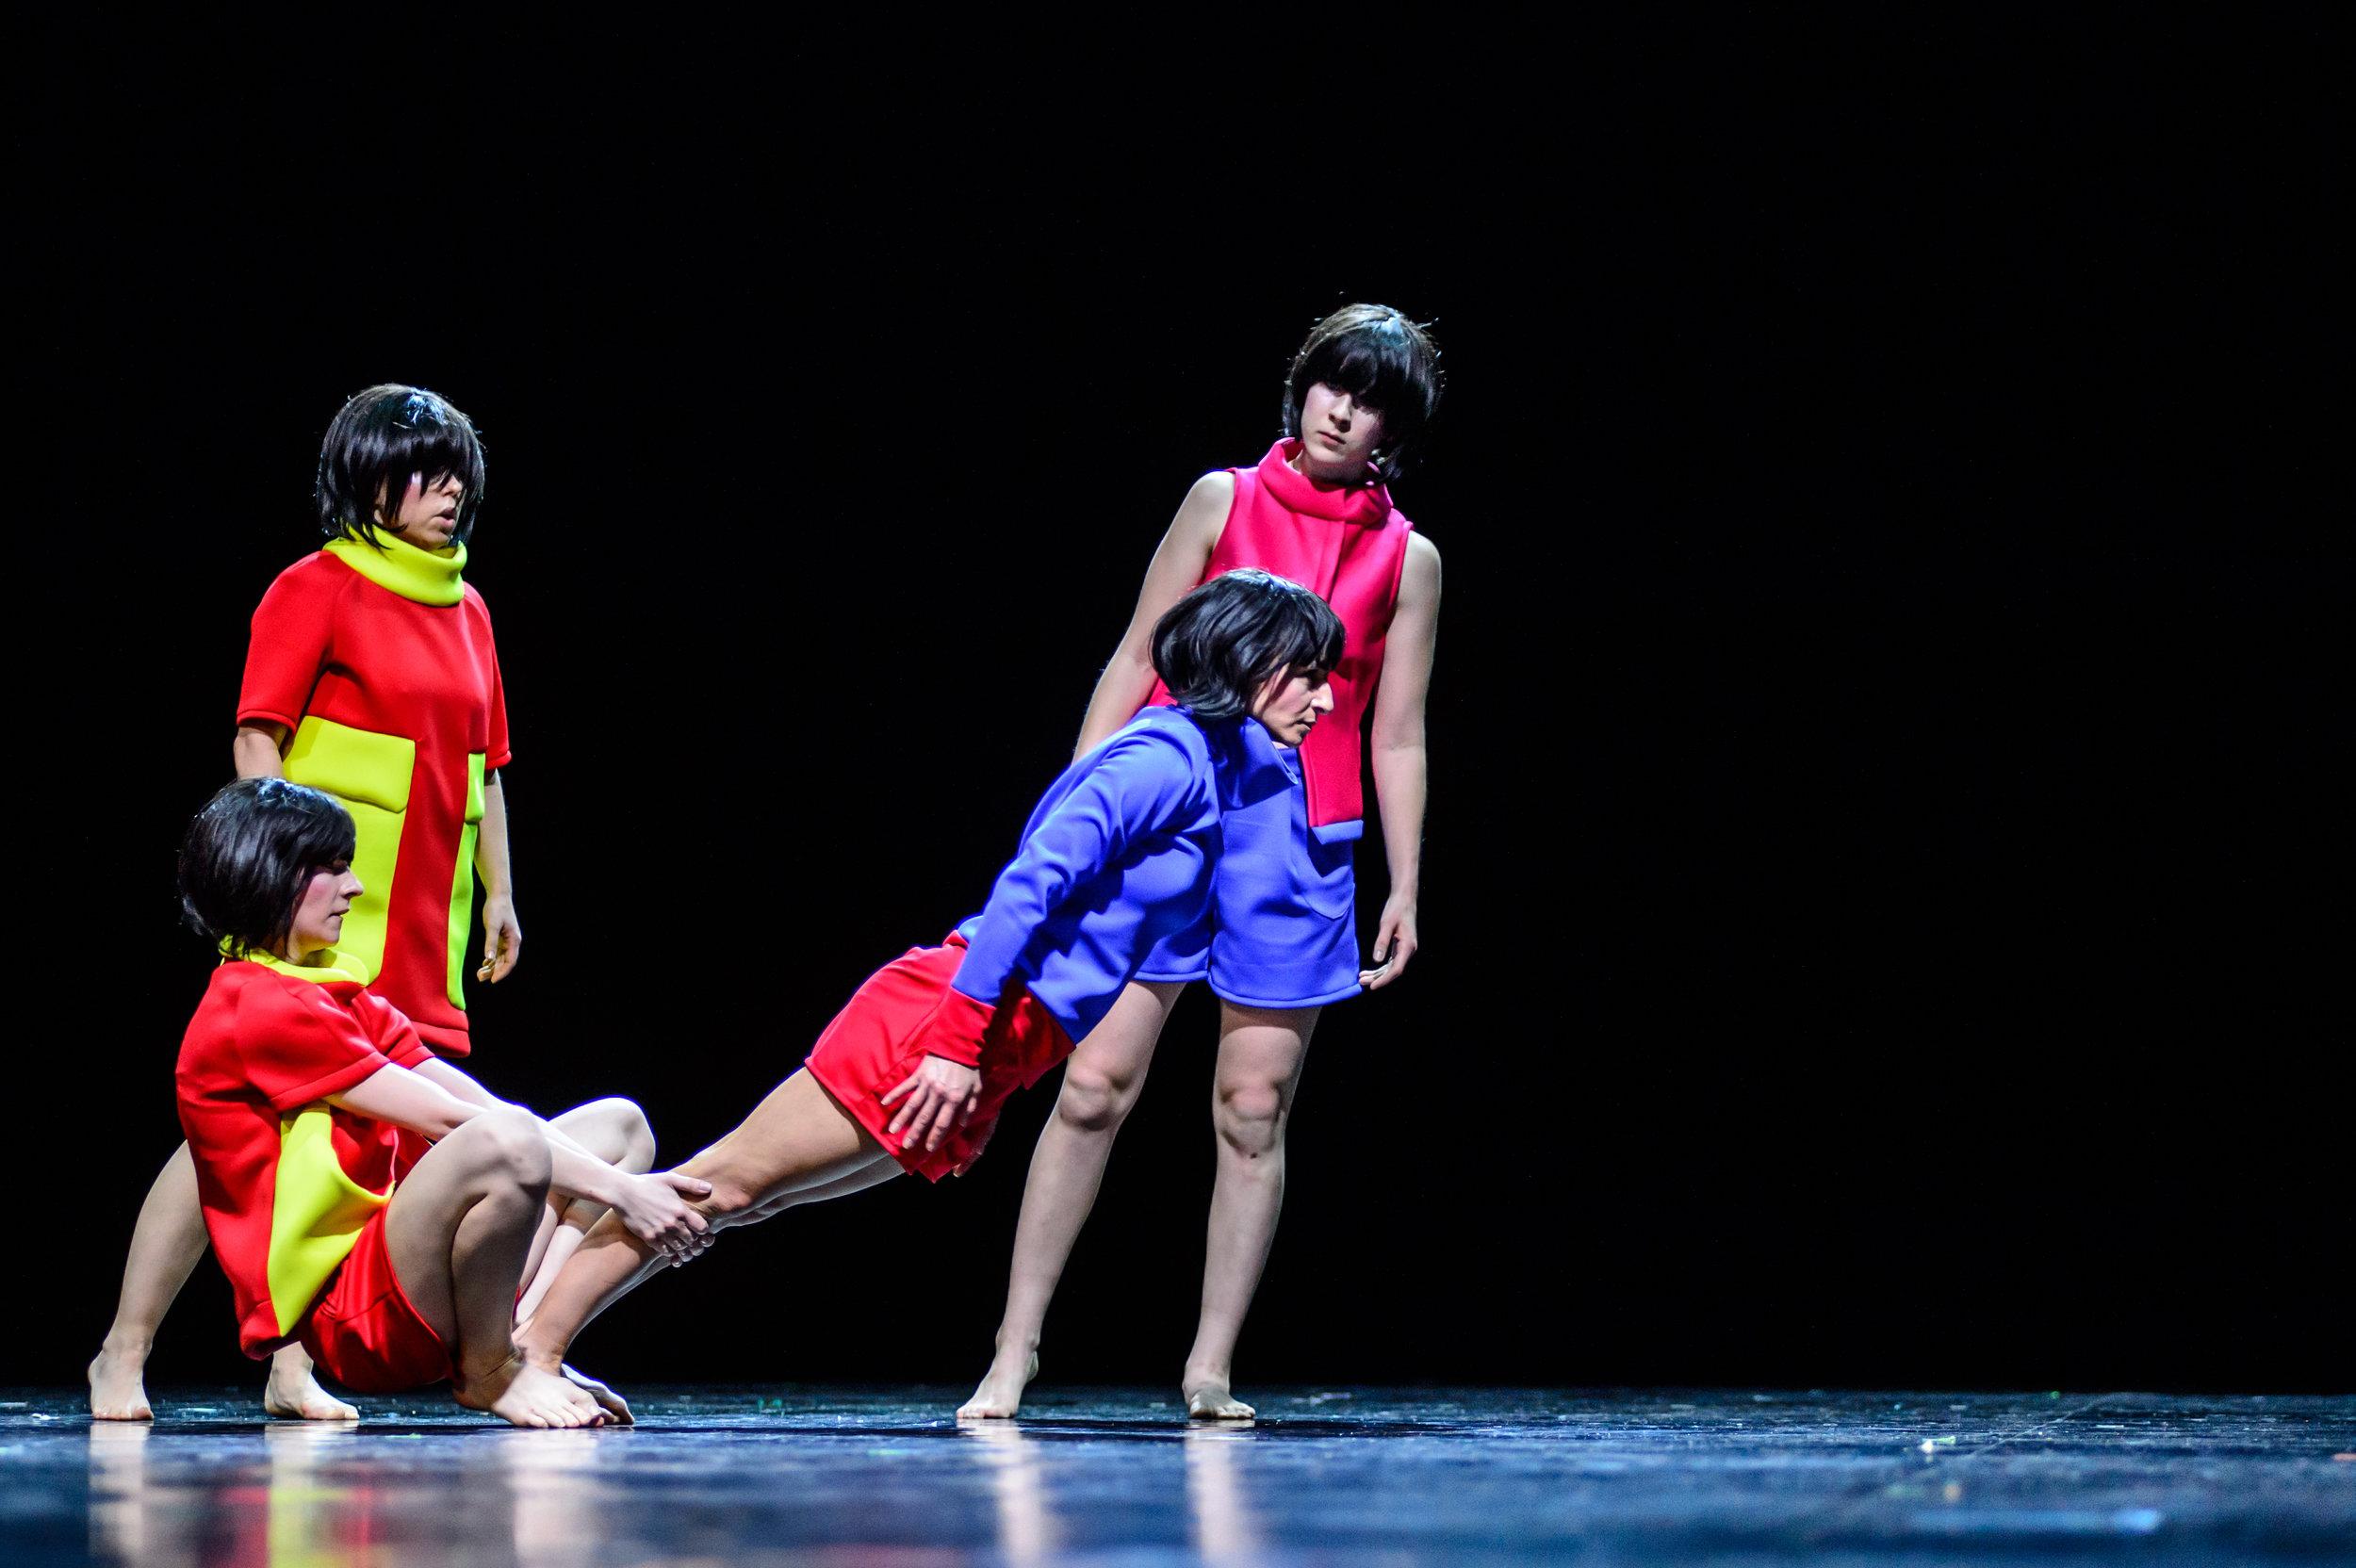 IV Konkurs Teatrów Tańca fot. Bartosz Kruk (59).jpg